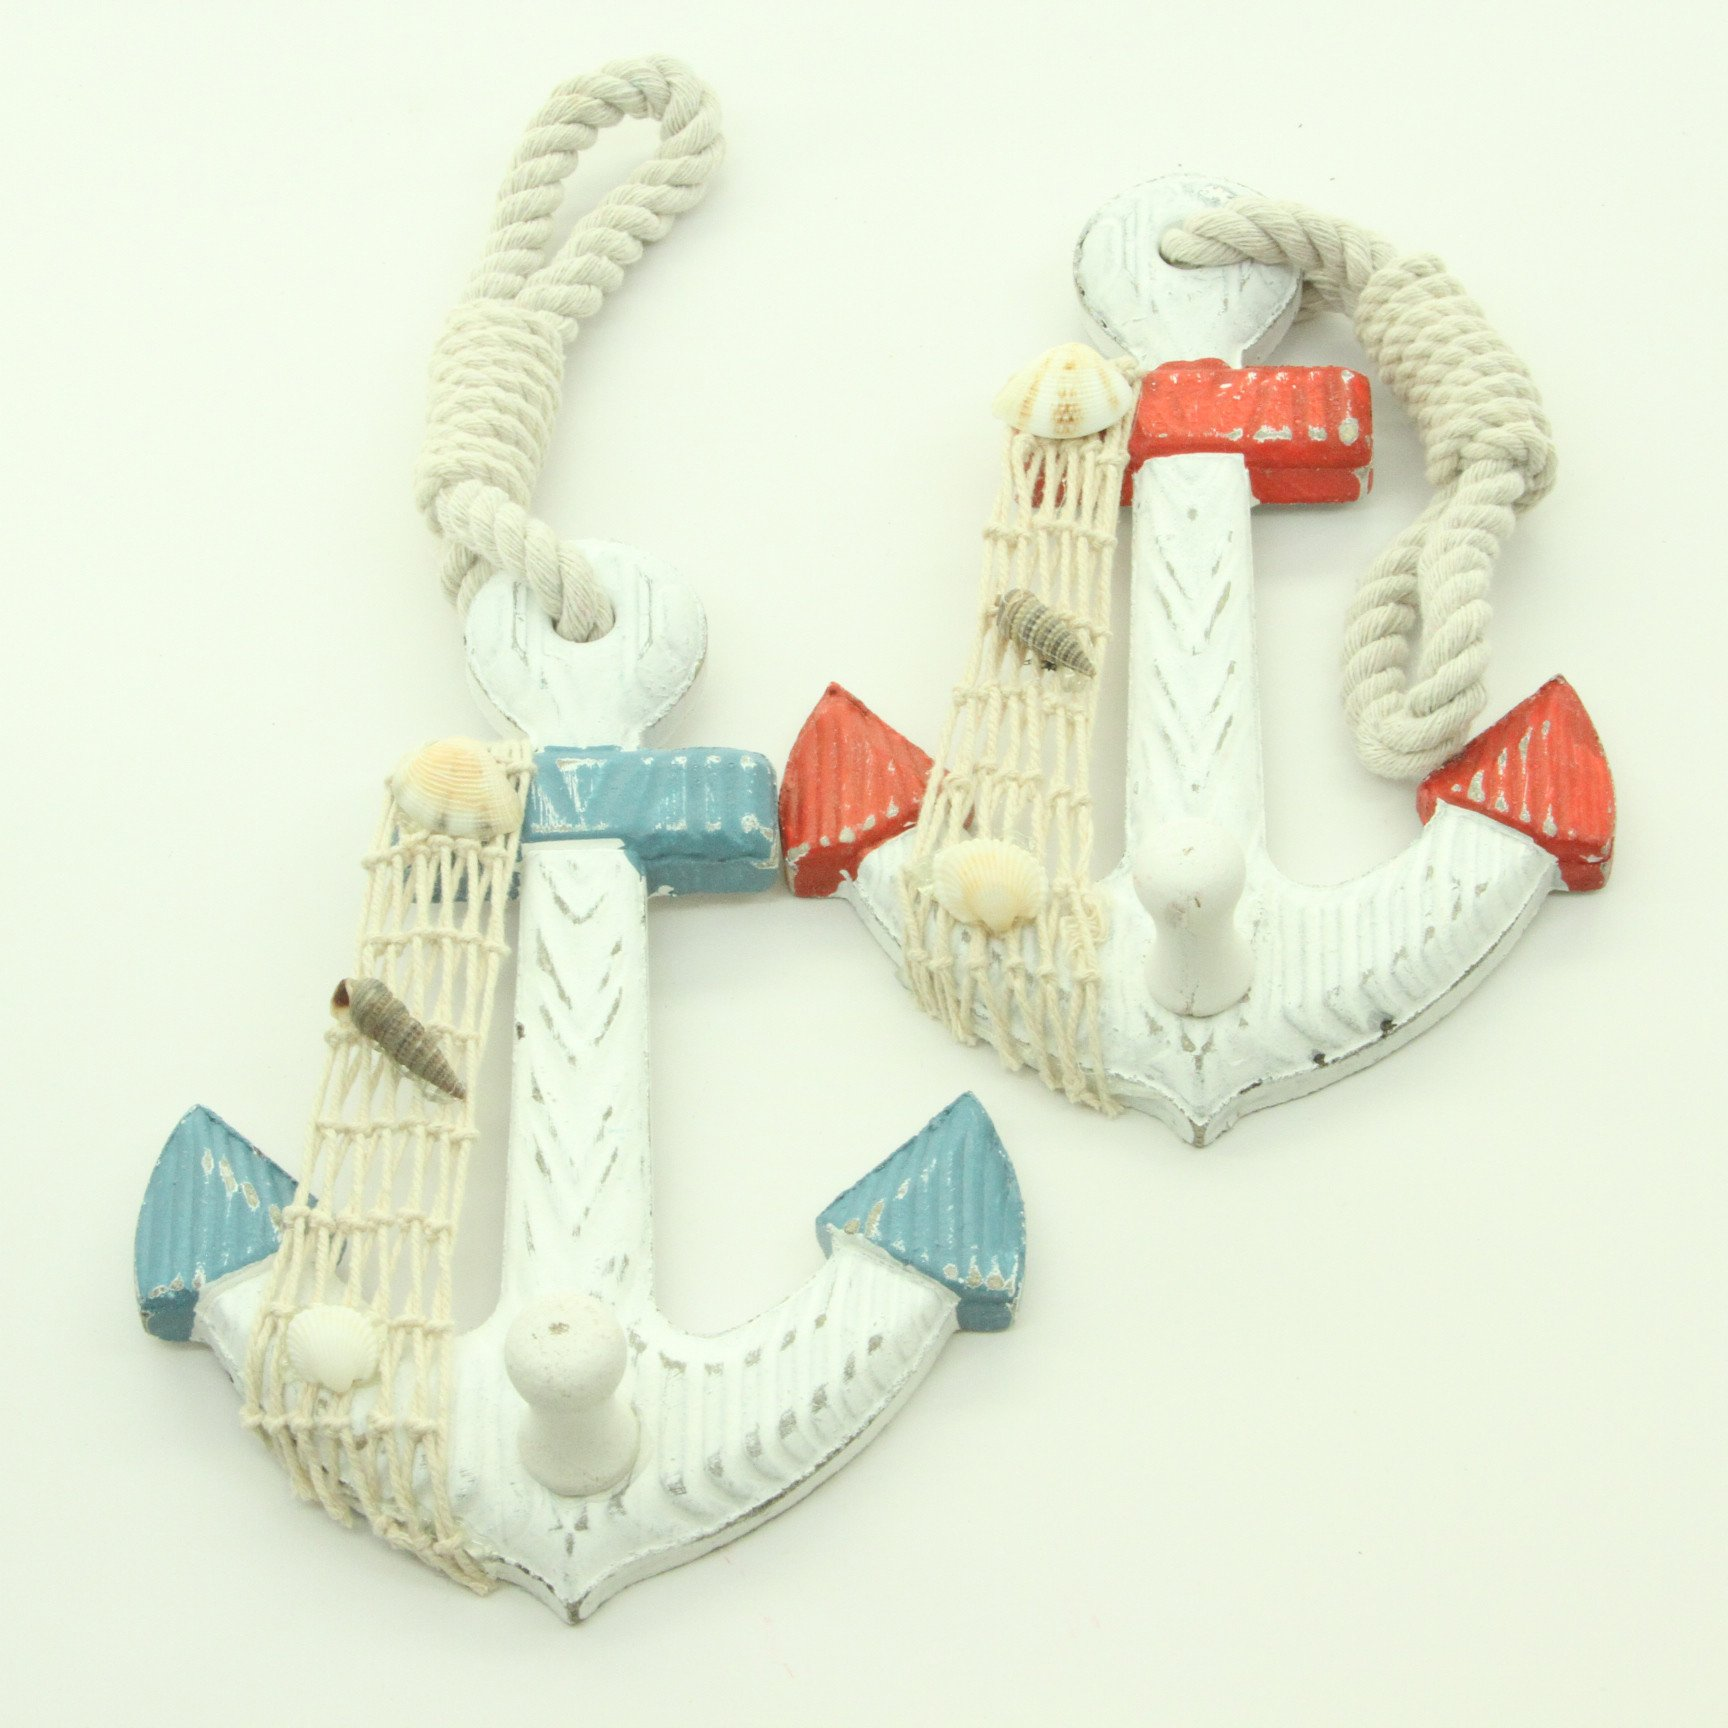 Set of 2 Wood Anchor Wall Hooks - Nautical Decor - New